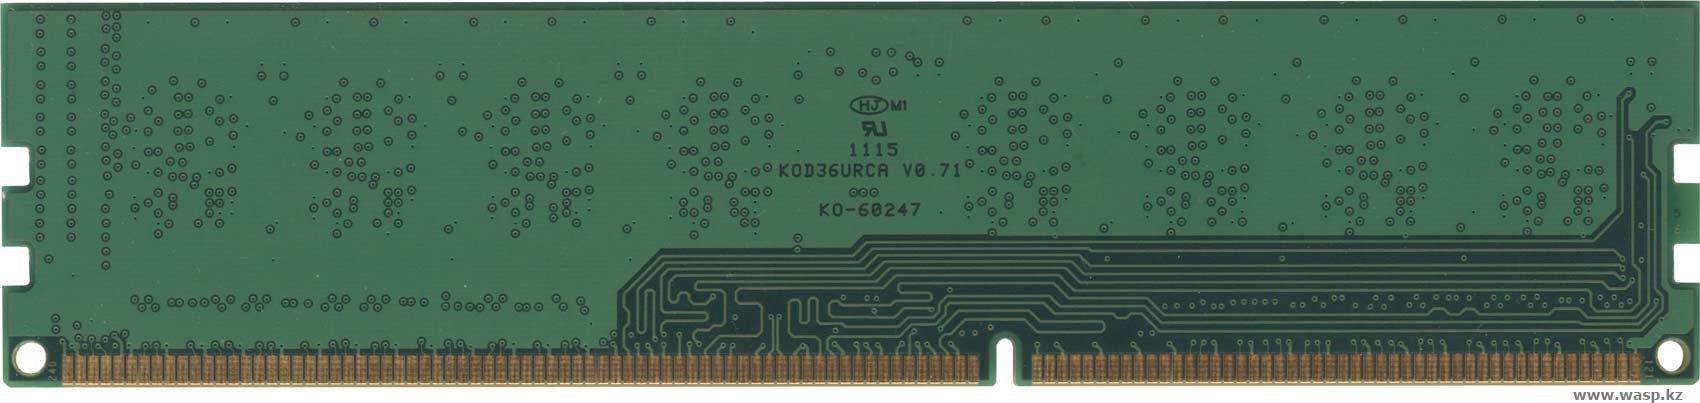 Оперативная память Simmtronics DDR3 2 GB 1333 MHz